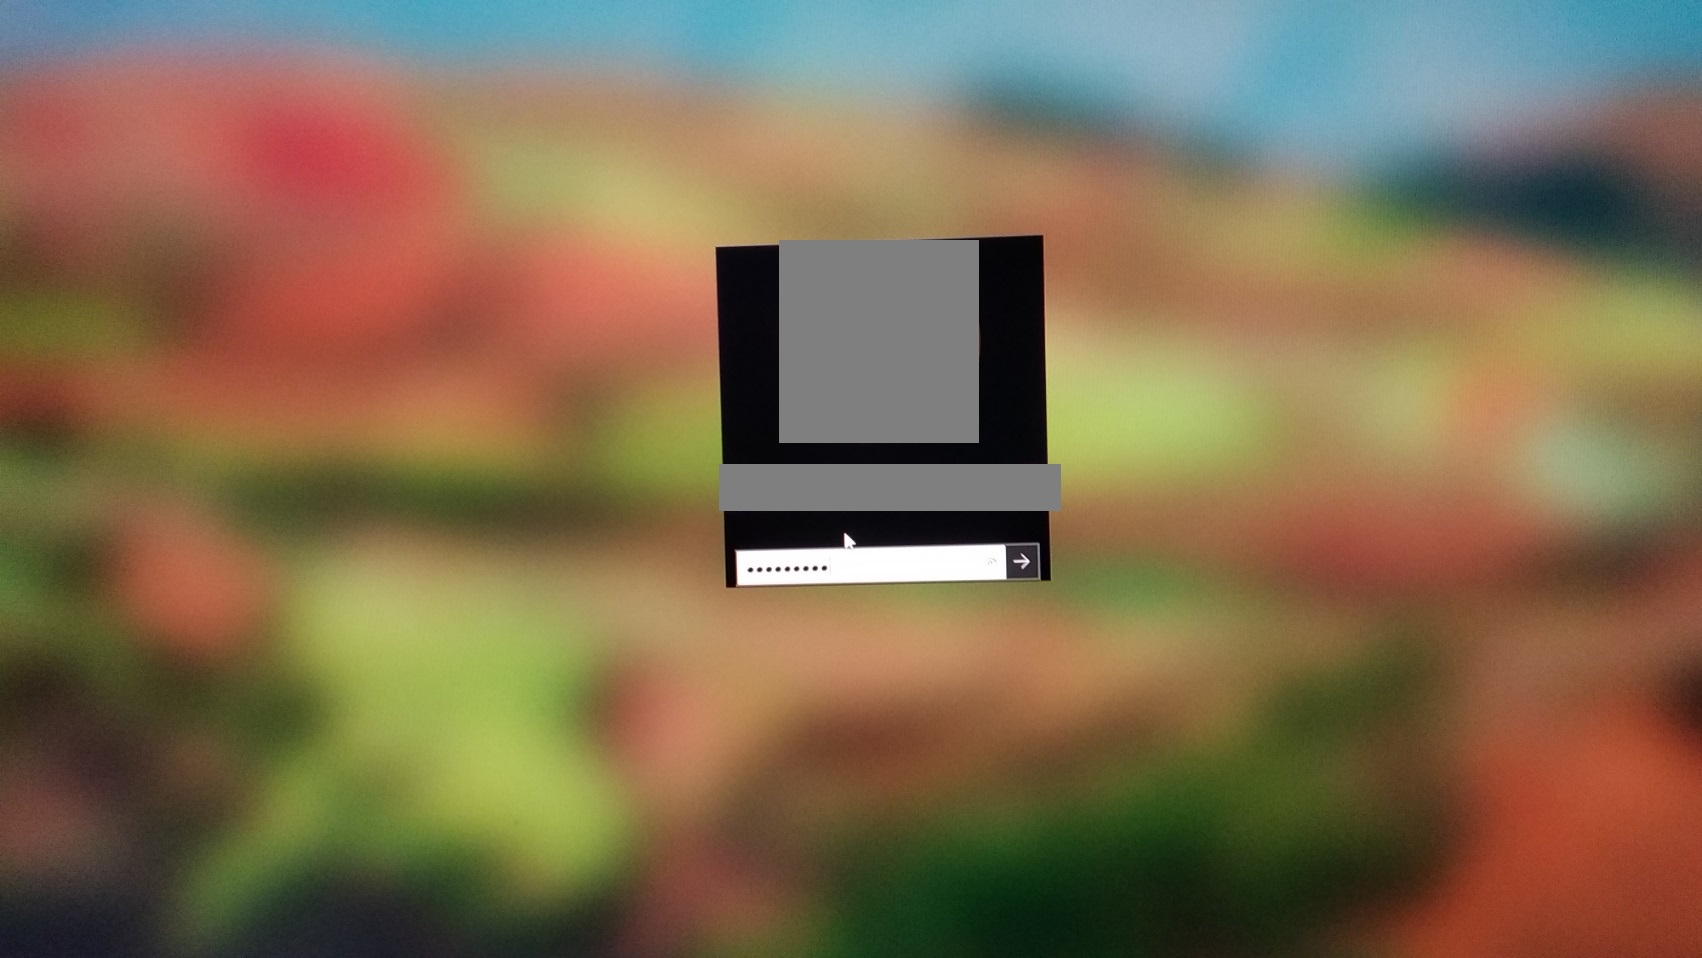 Black squares on login screen Windows 10 8090ff6f-5254-4de9-a5f2-f82ef12b7a9c?upload=true.jpg